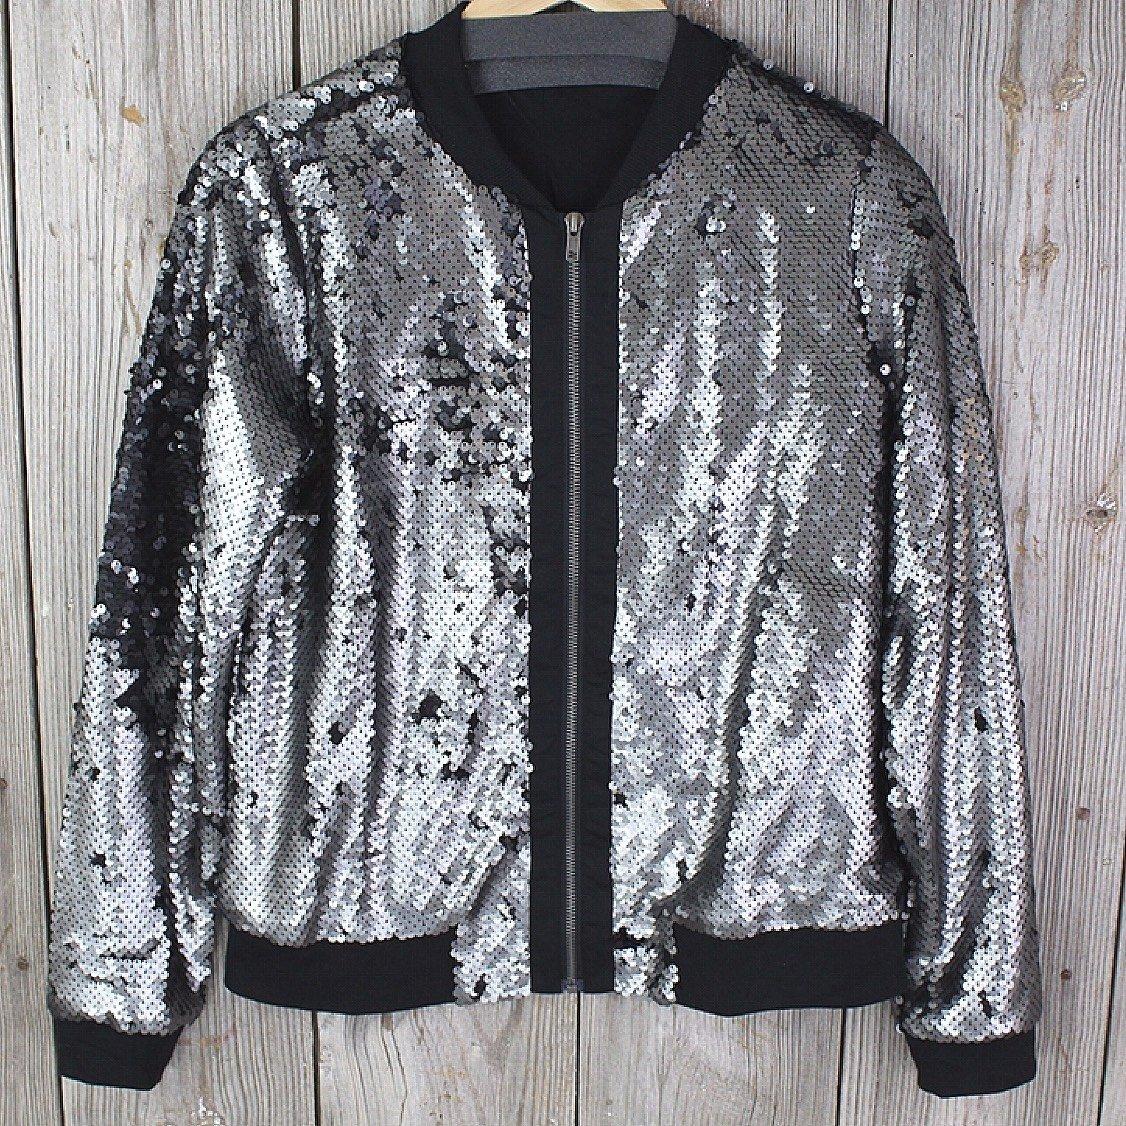 Sequin Jacket from Mystree